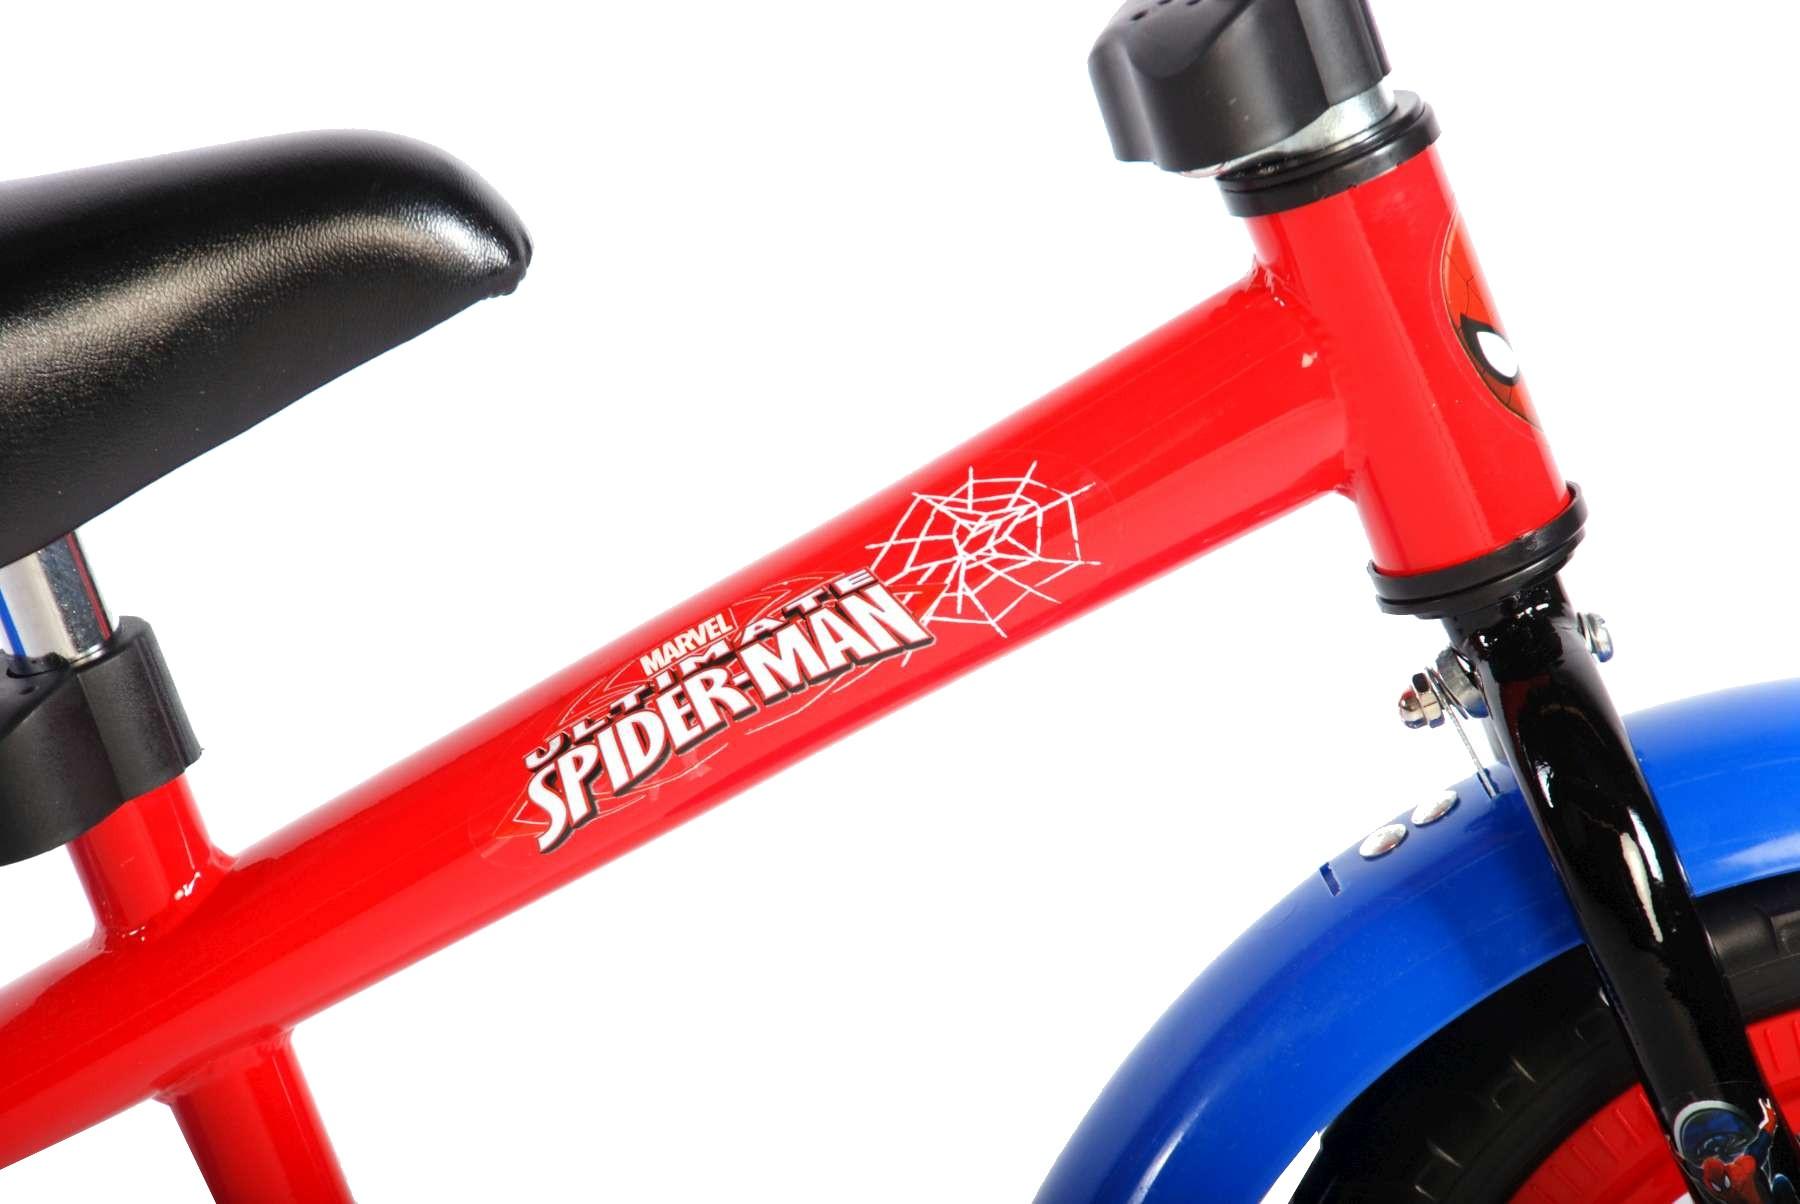 Volare Spider-Man loopfiets 12 Inch Jongens Rood - Internet-Bikes